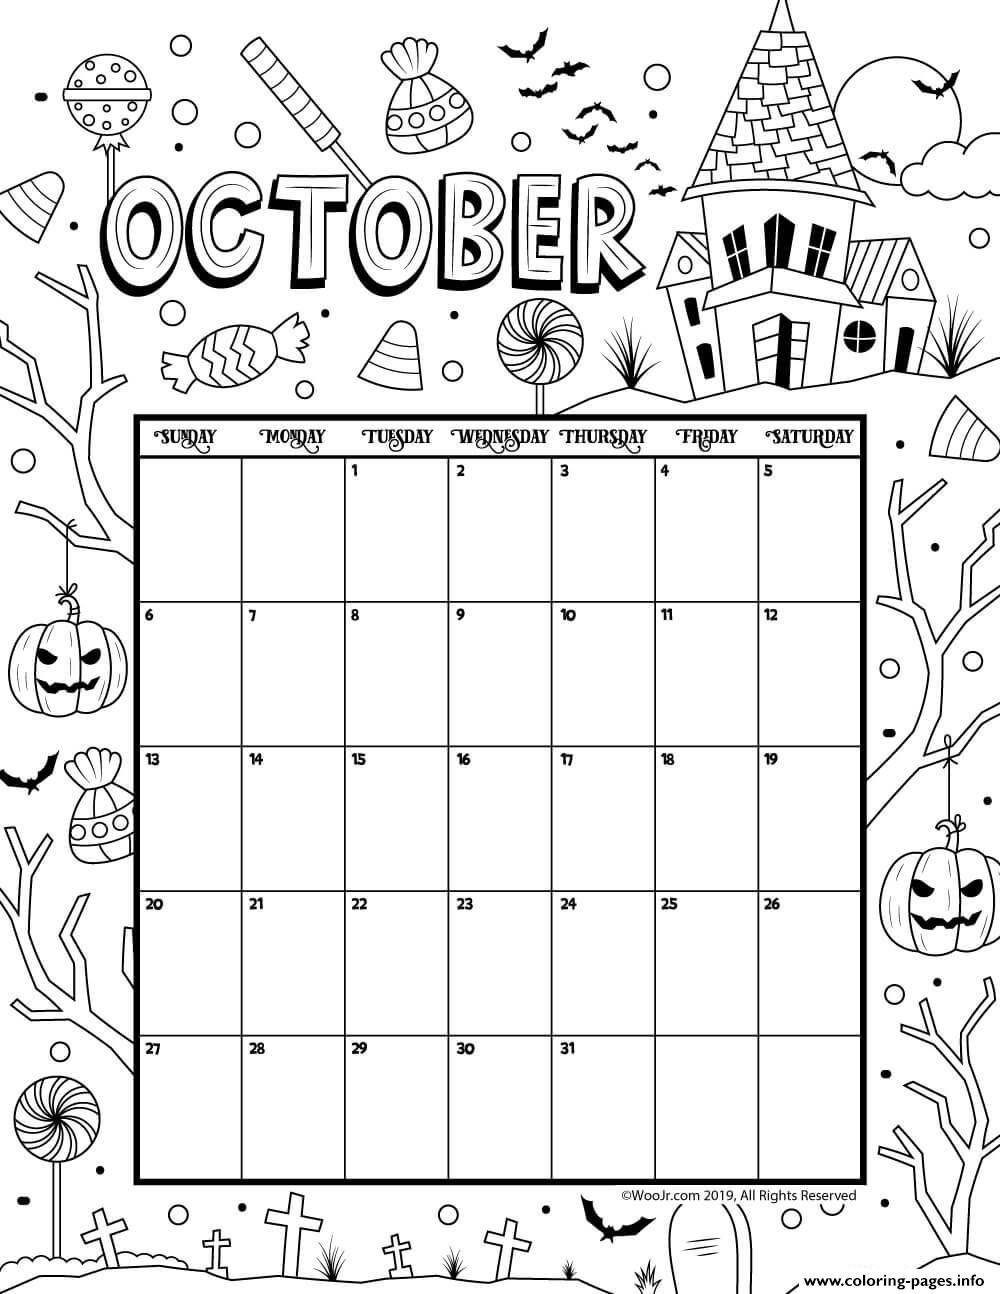 Google Image Result For Https Cdn Clipart Email 4fa387db53d530de9f81b5d04ad36212 Coloring Book 15471 Kids Calendar Coloring Calendar Printable Calendar Pages [ 1294 x 1000 Pixel ]